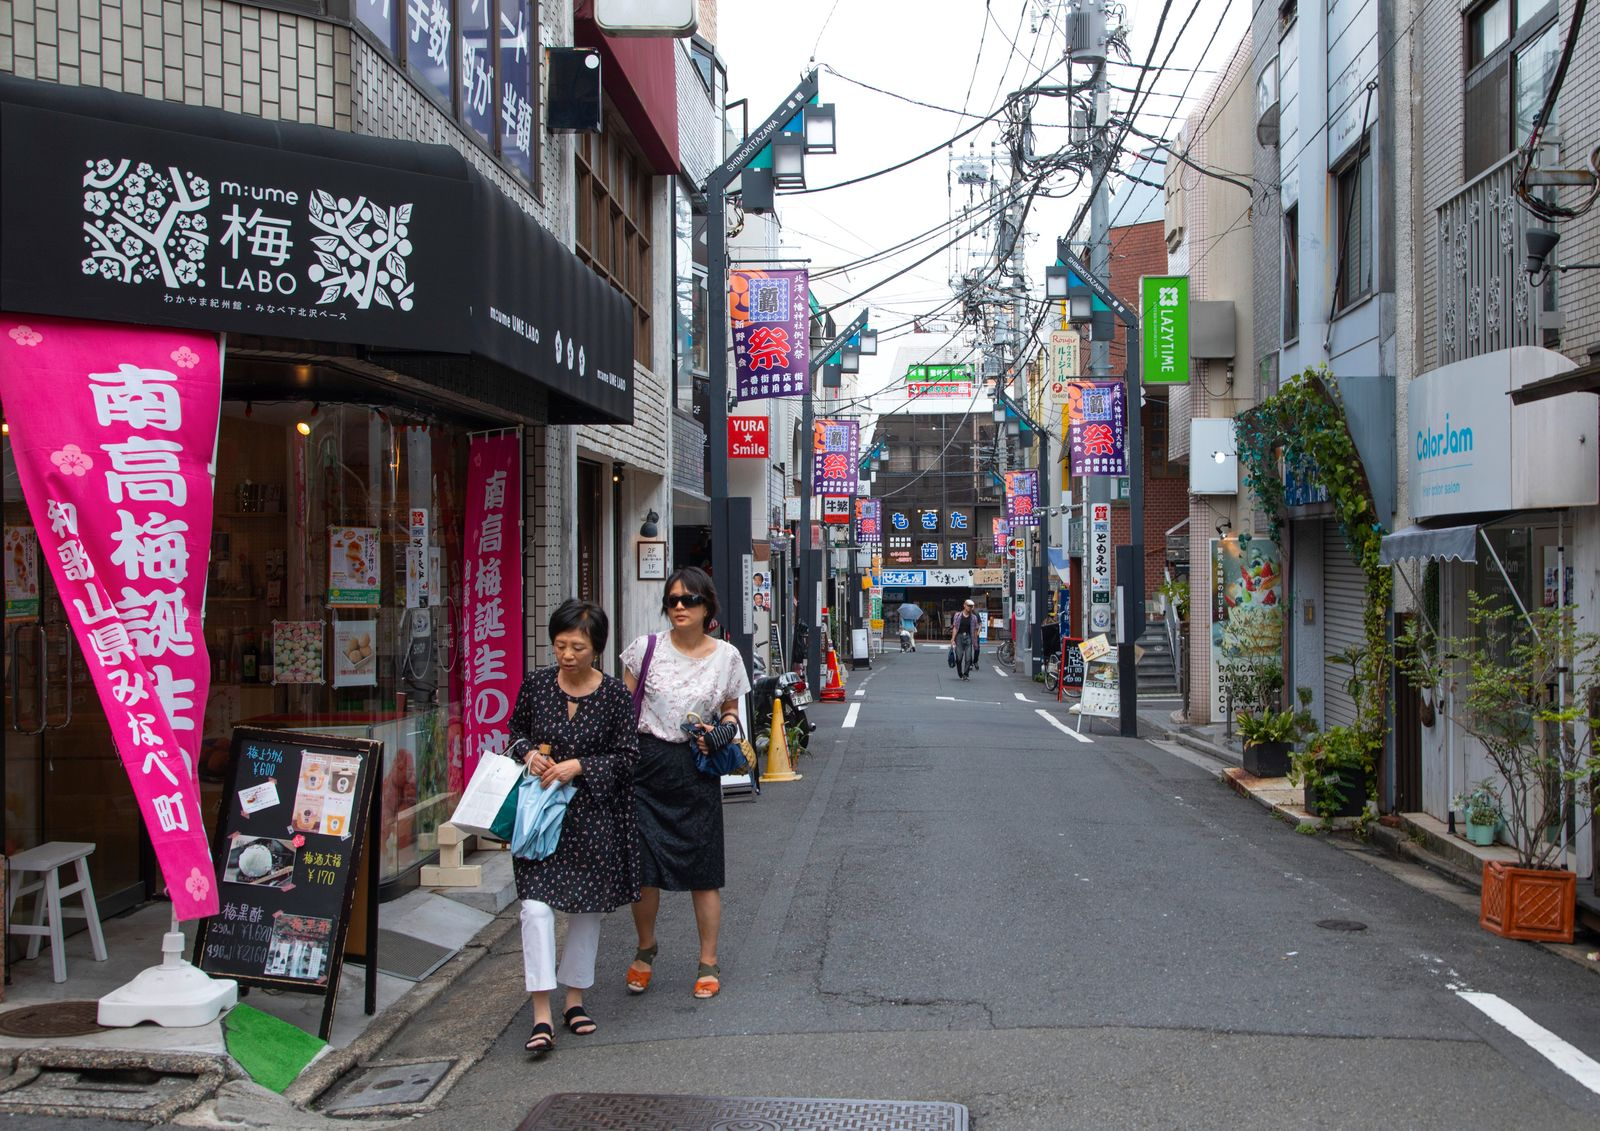 People walking in Daikanyama area, Kanto region, Tokyo, Japan